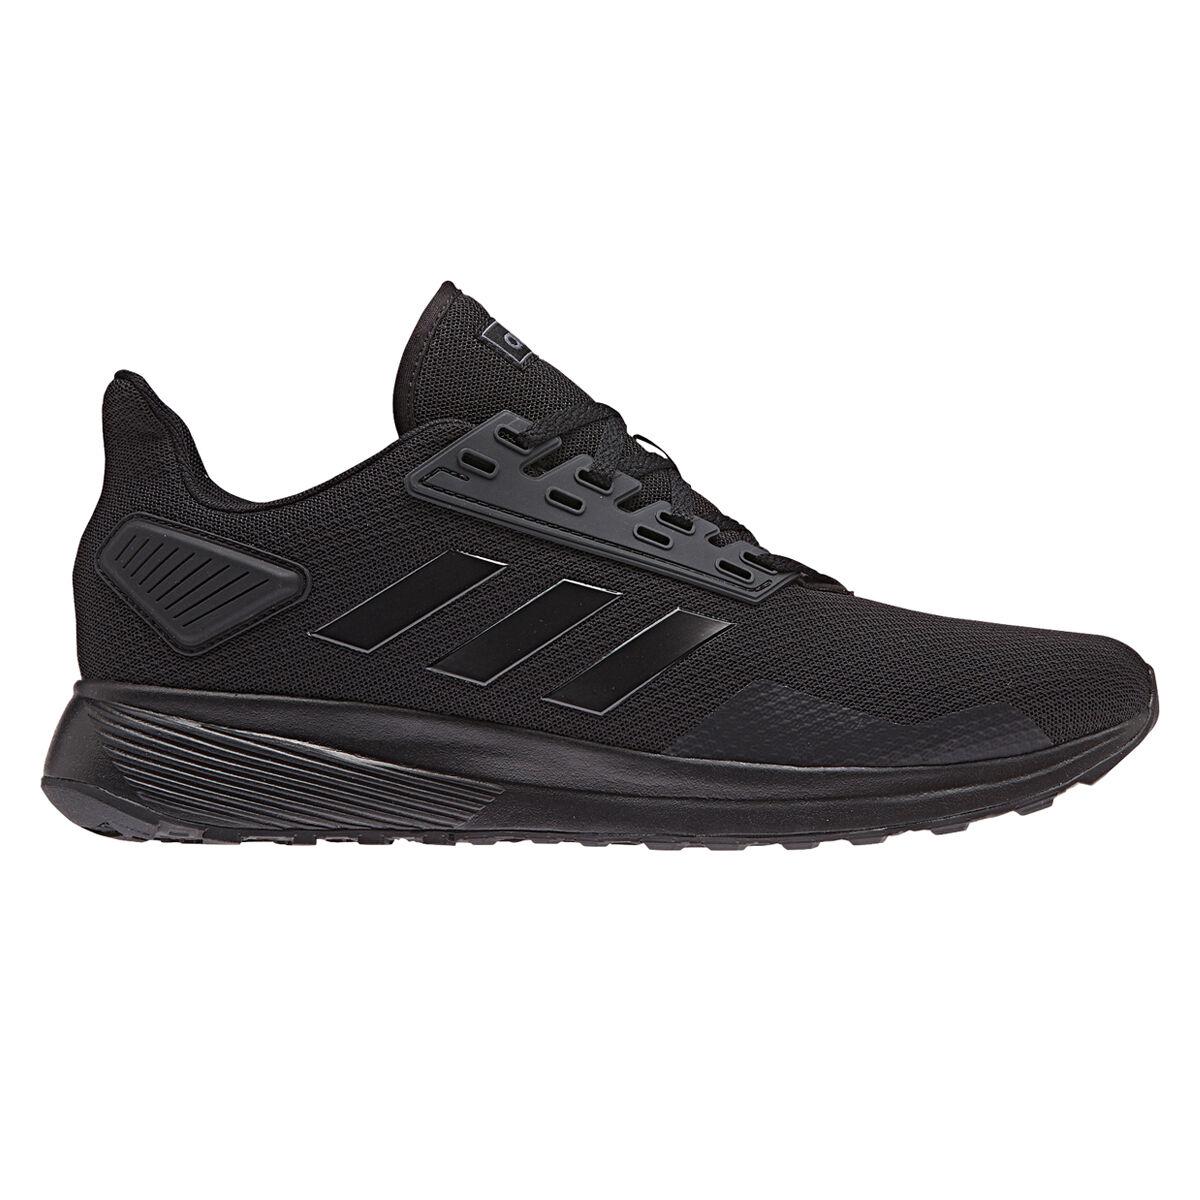 ADIDAS Duramo 9 Running Shoes For Men